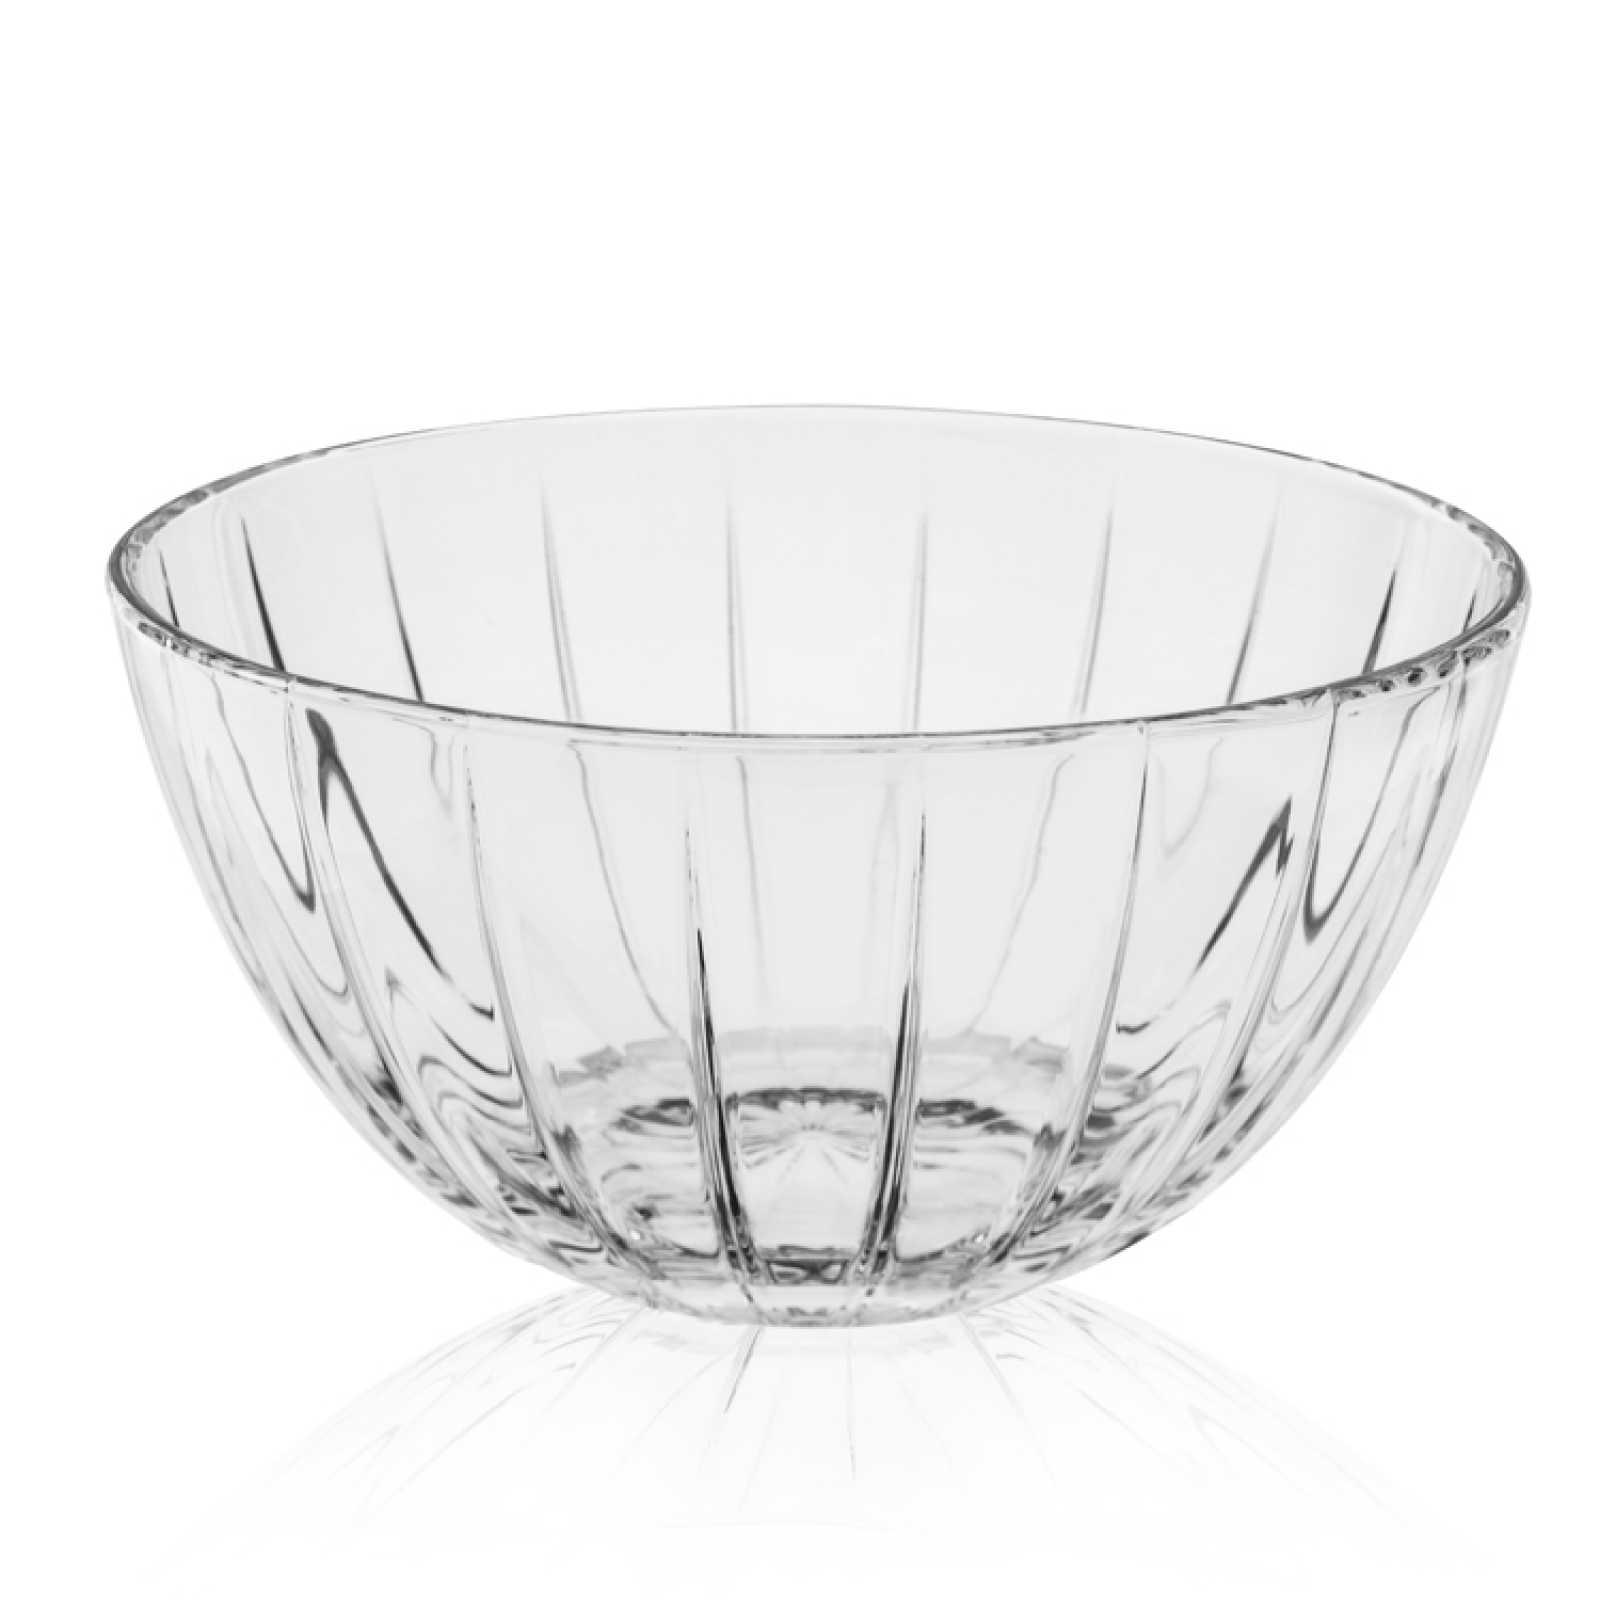 Онлайн каталог PROMENU: Пиала стеклянная Vidivi ACCADEMIA, диаметр 13,5 см, прозрачный Vidivi 67143M